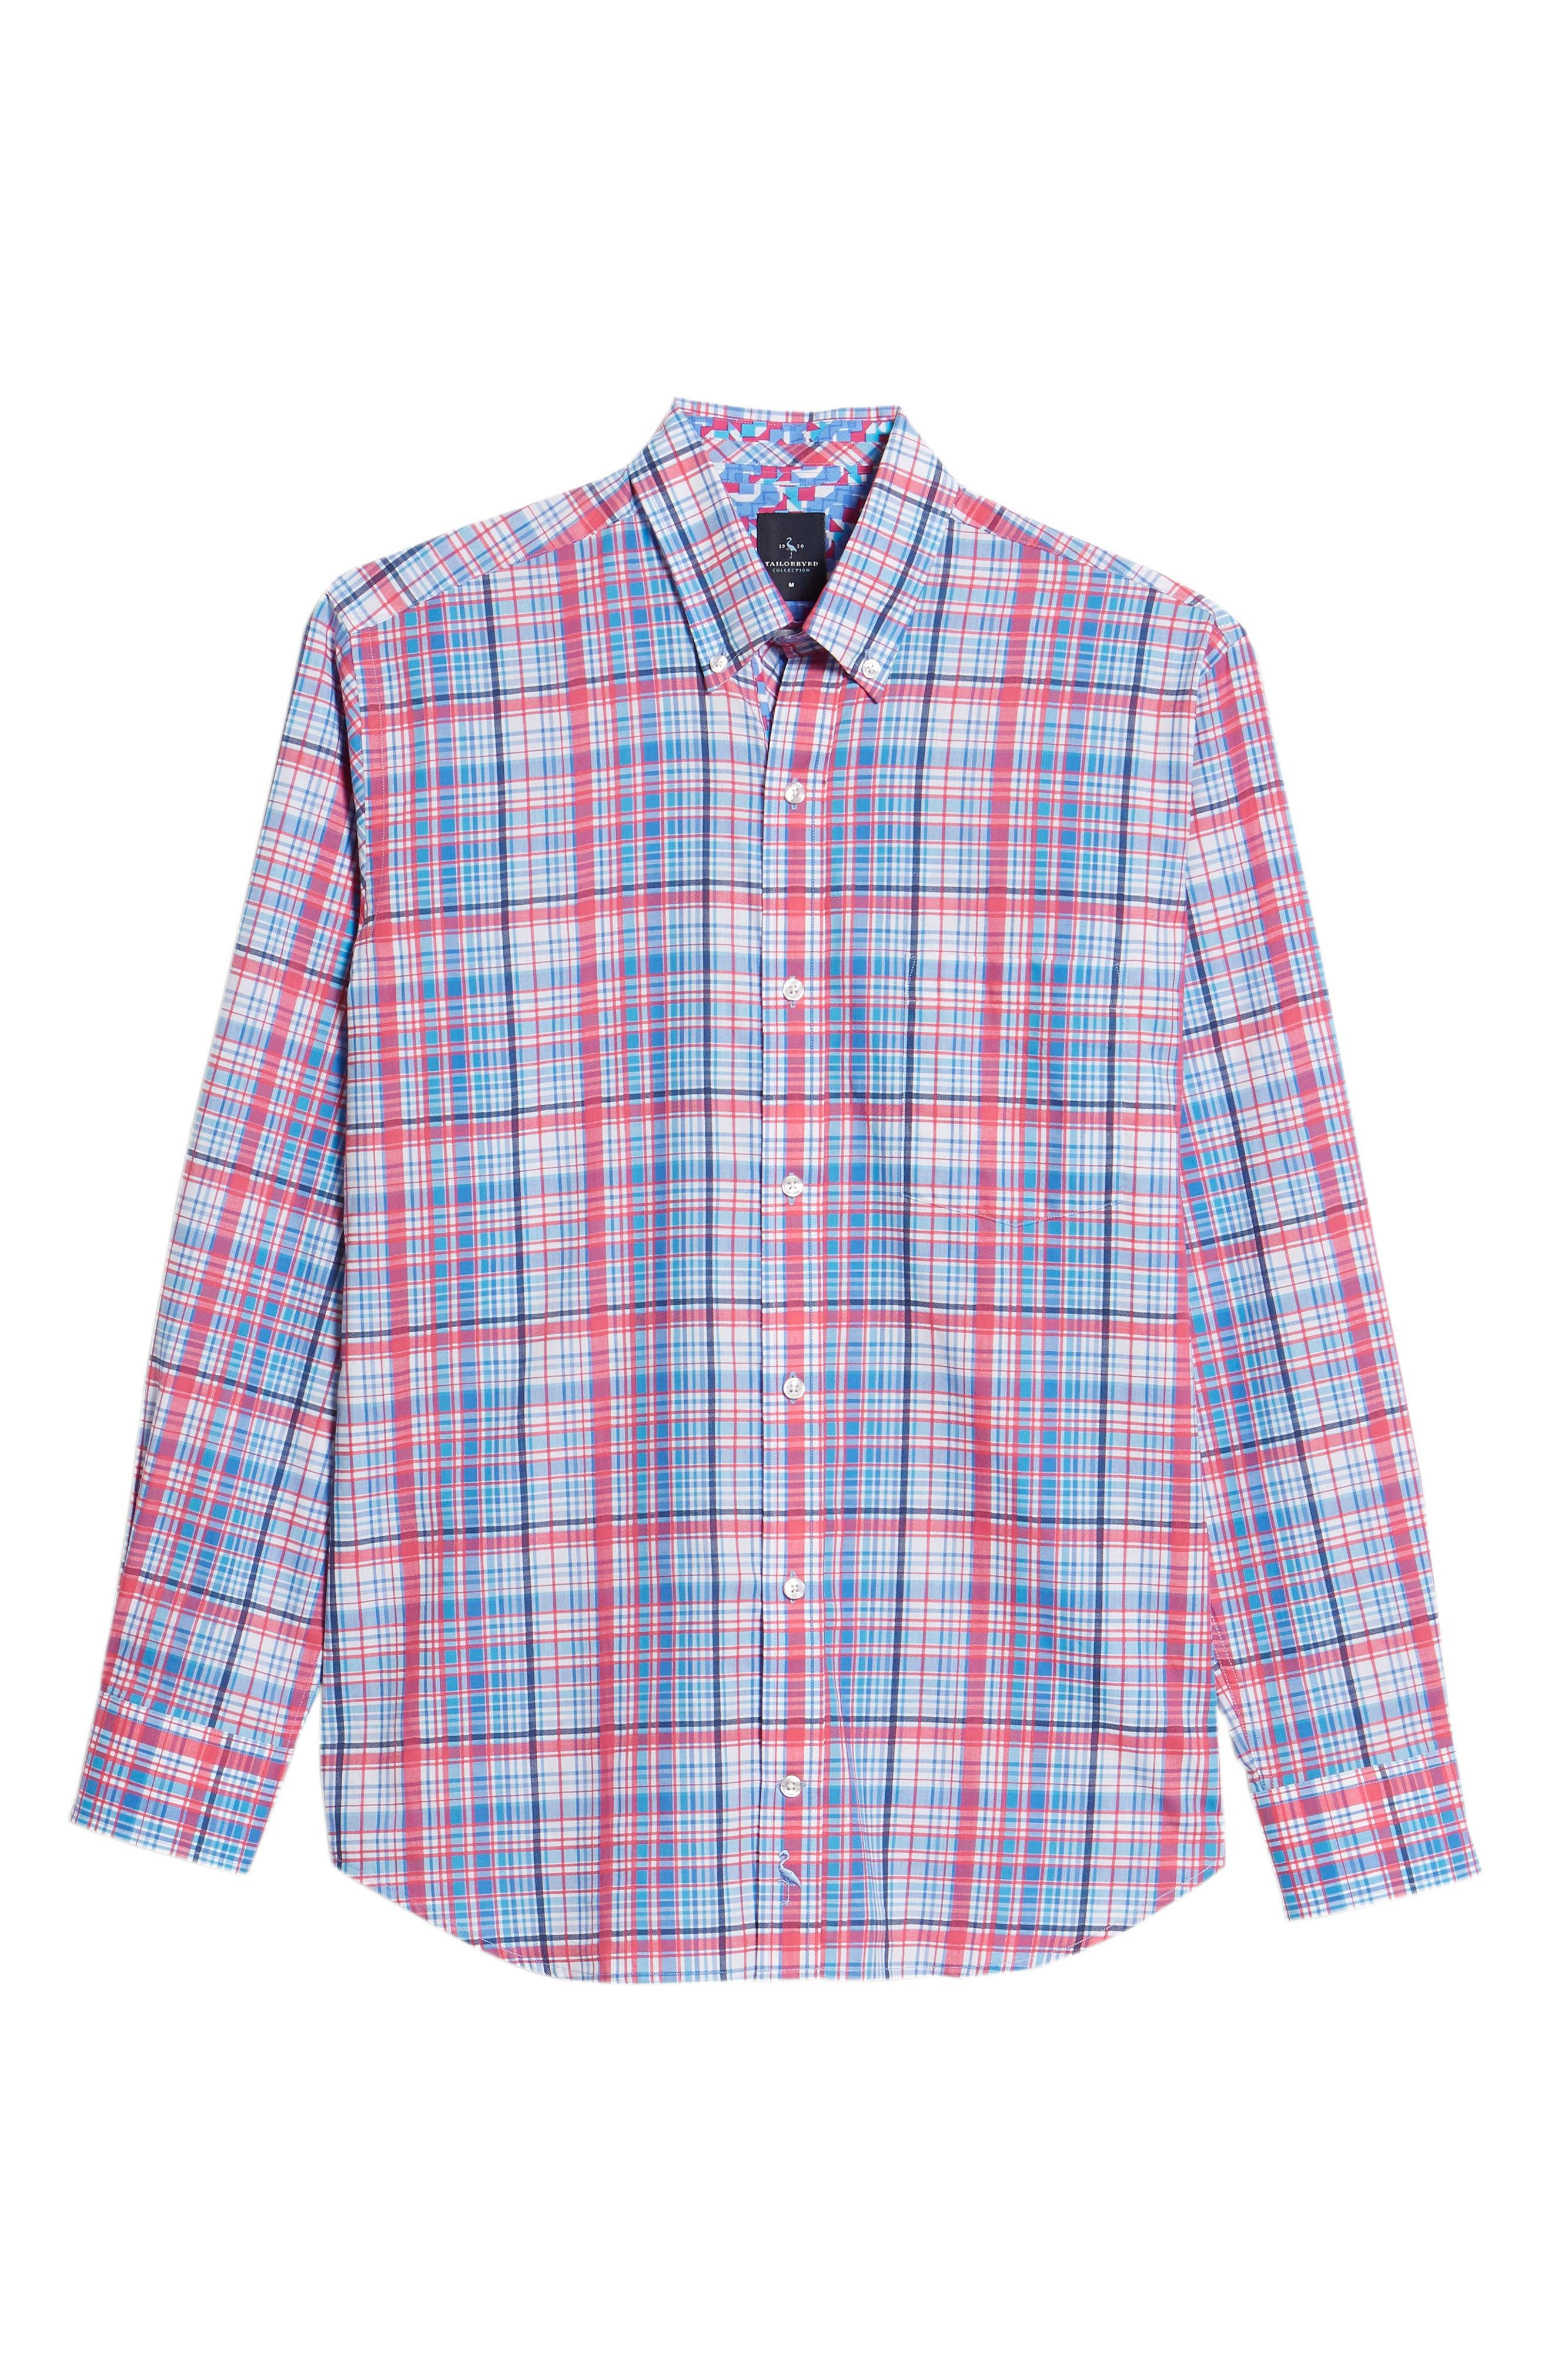 Beacon Regular Fit Plaid Sport Shirt,                             Alternate thumbnail 6, color,                             650